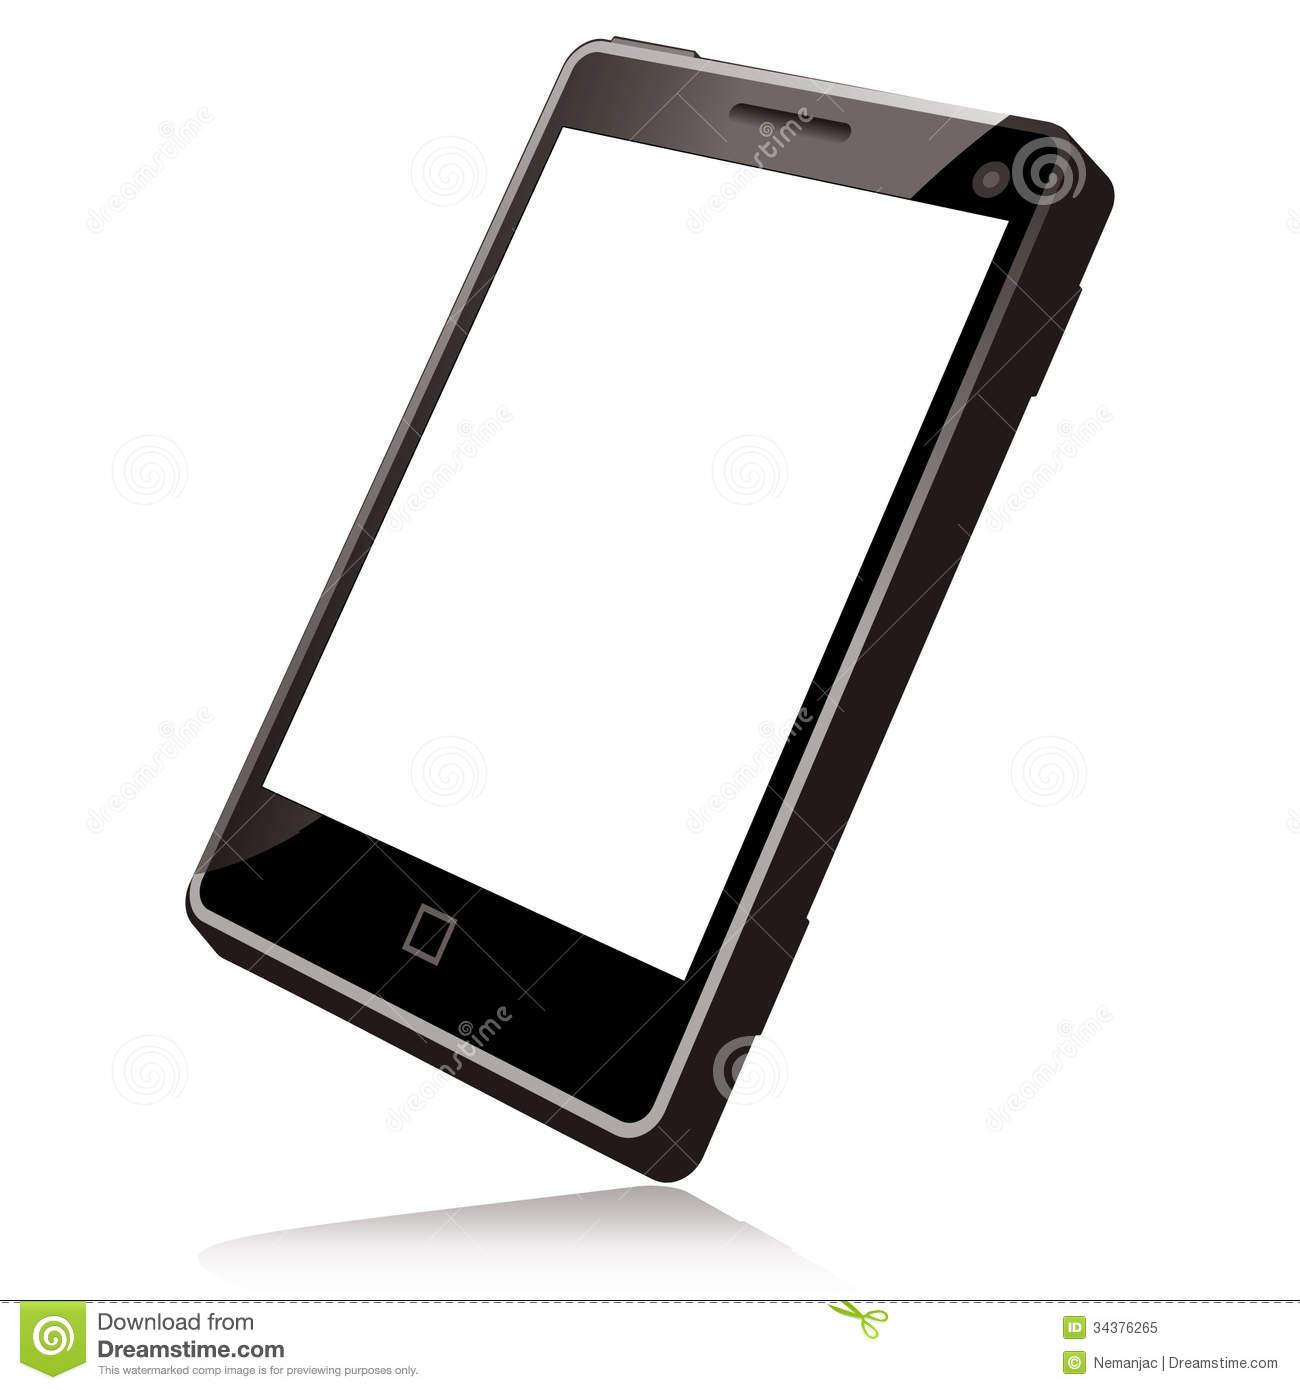 smartphone clipart - photo #45